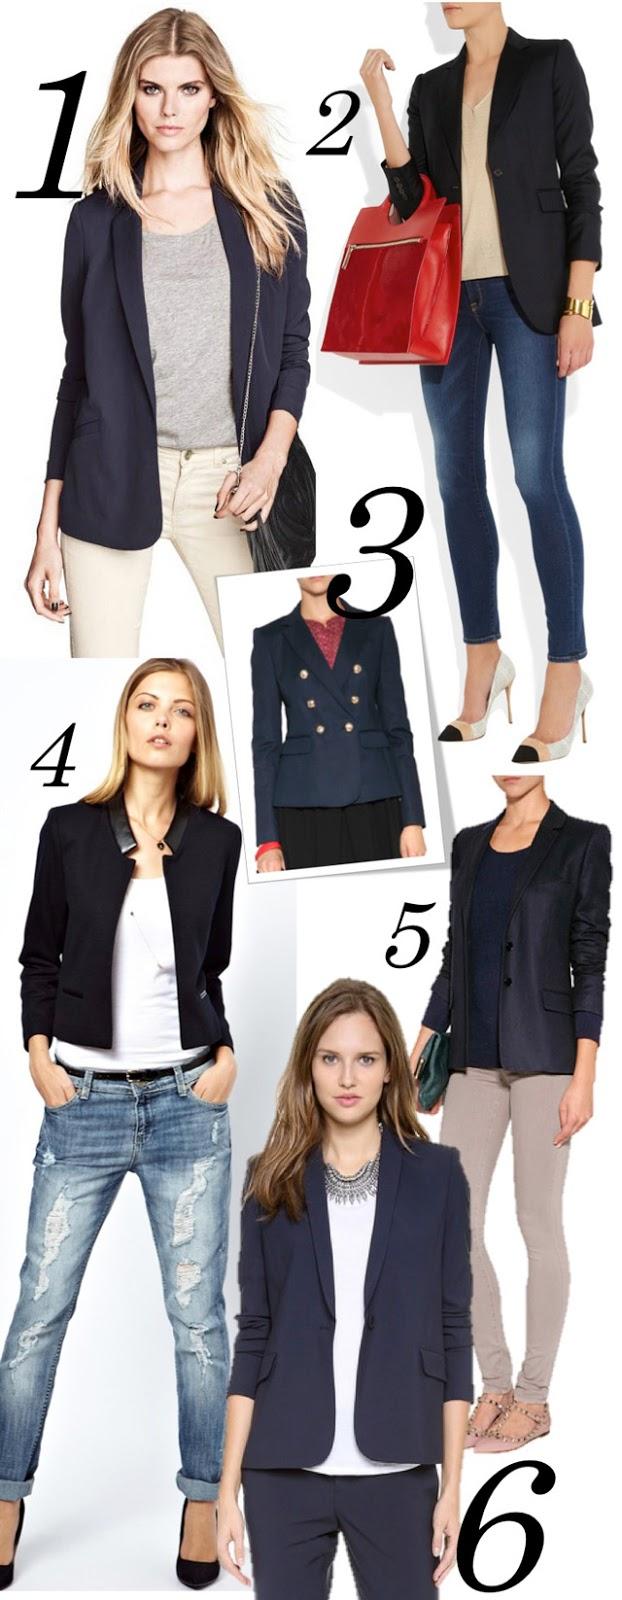 shopping for womens clothing online, интернет магазин женской одежды